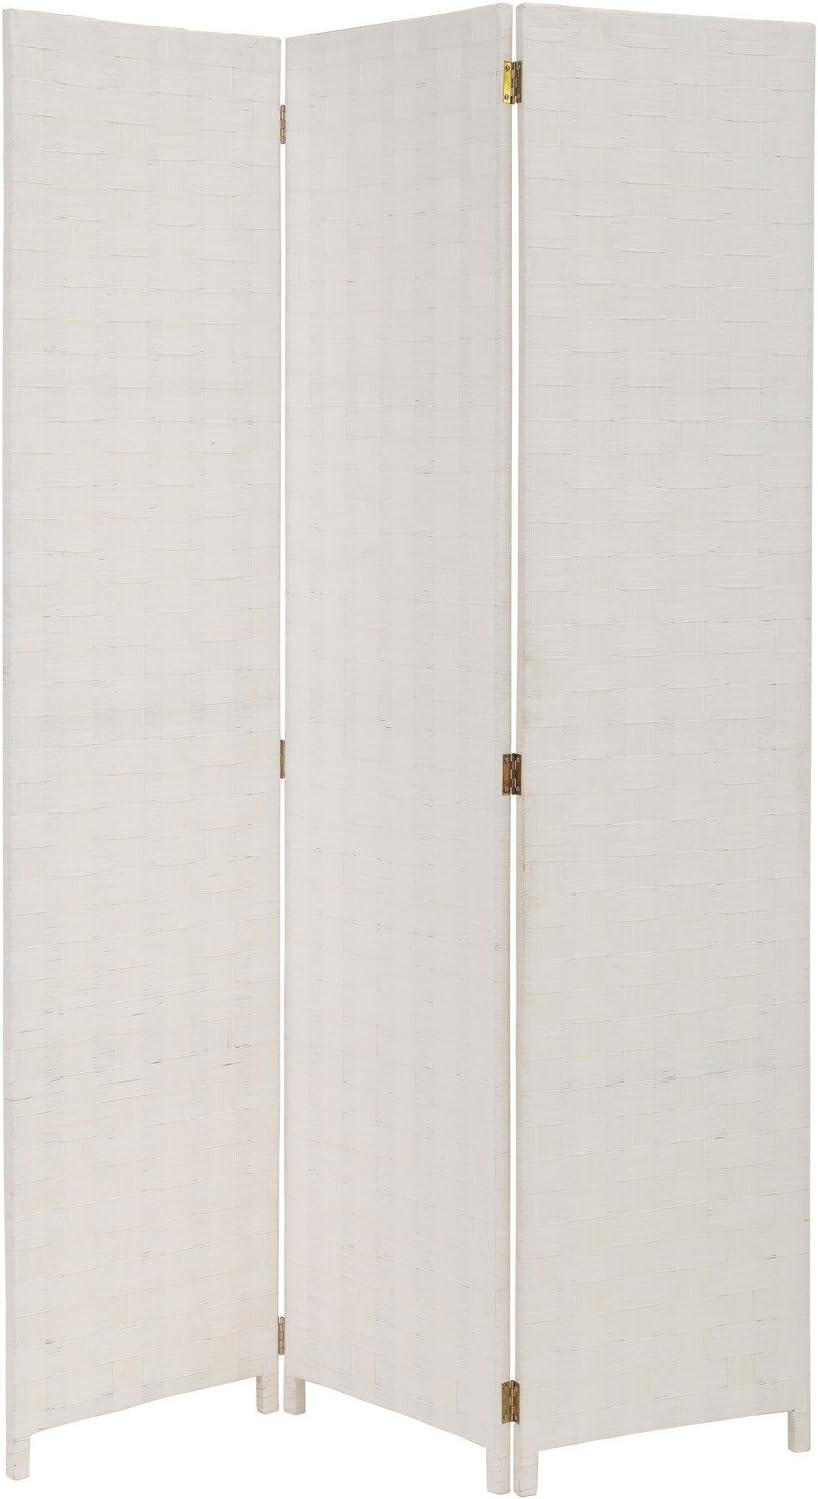 Lola Derek Biombo plegable oriental blanco de madera para salón Vitta: Amazon.es: Hogar